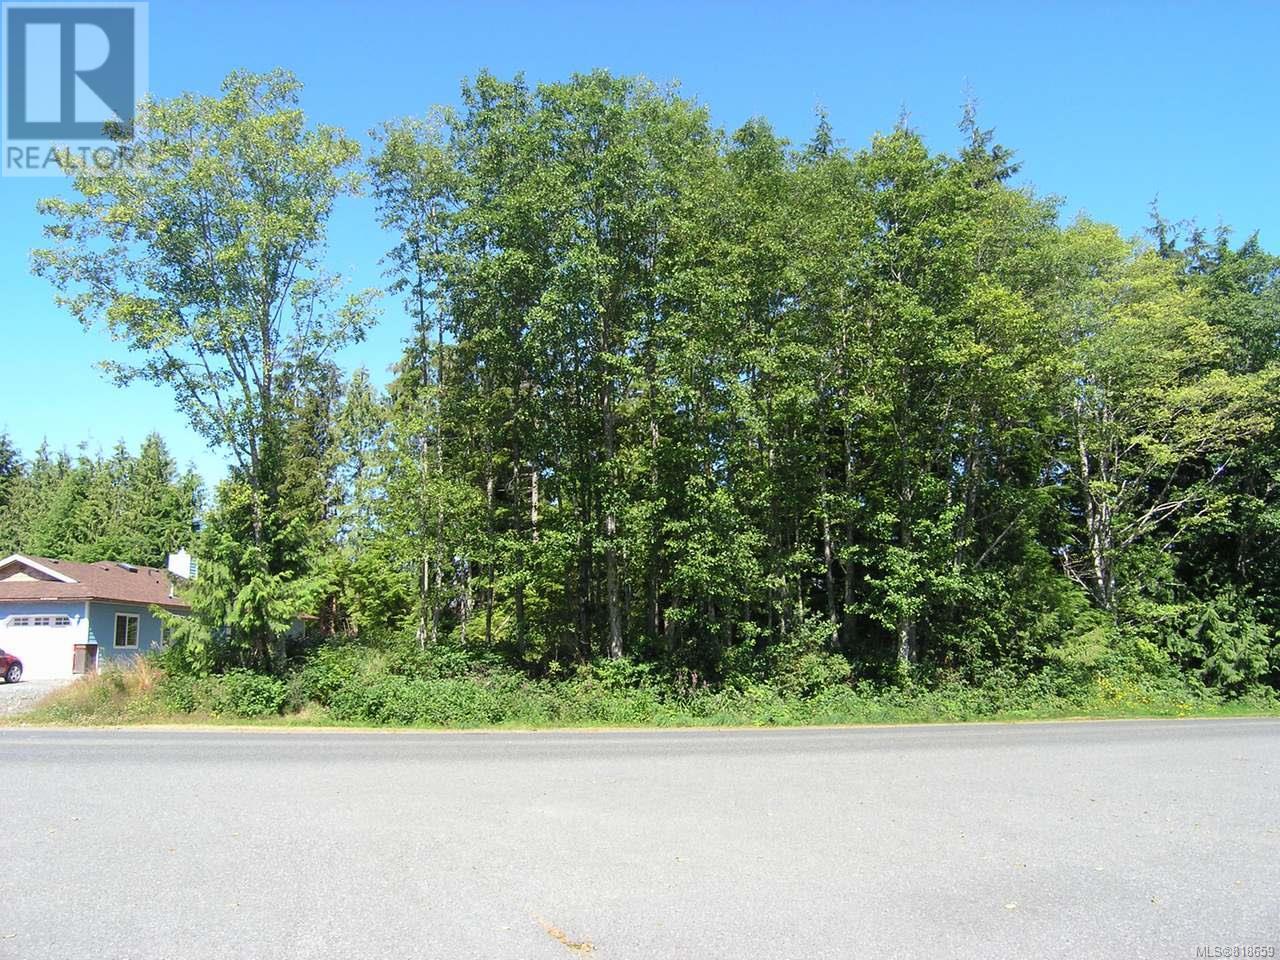 7160 Highland Dr, Port Hardy, British Columbia  V0P 2N0 - Photo 8 - 818659